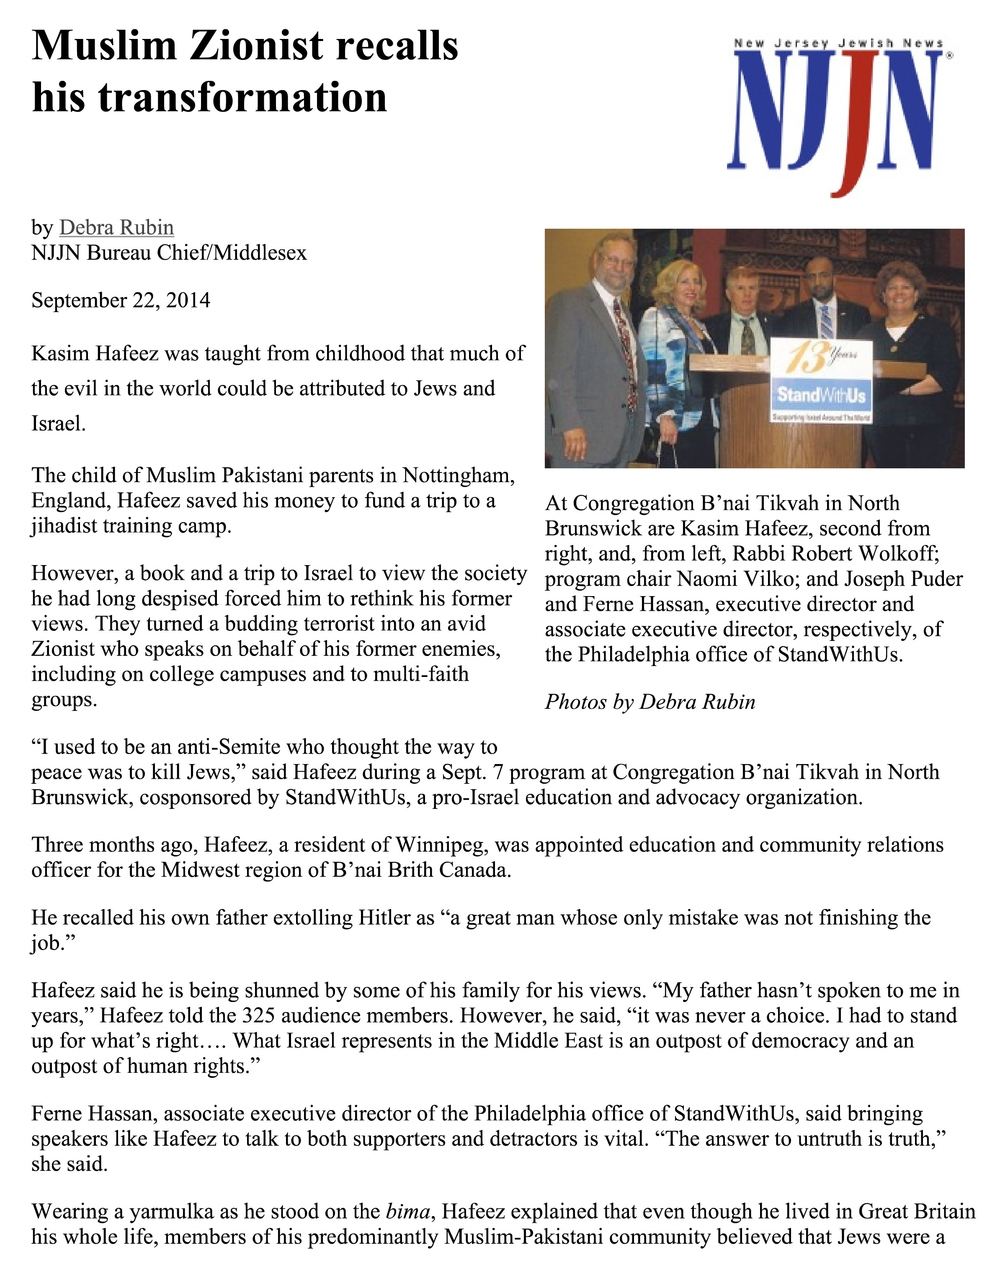 Muslim Zionist recalls his transformation _ NJJN Sept 22 2014.jpg